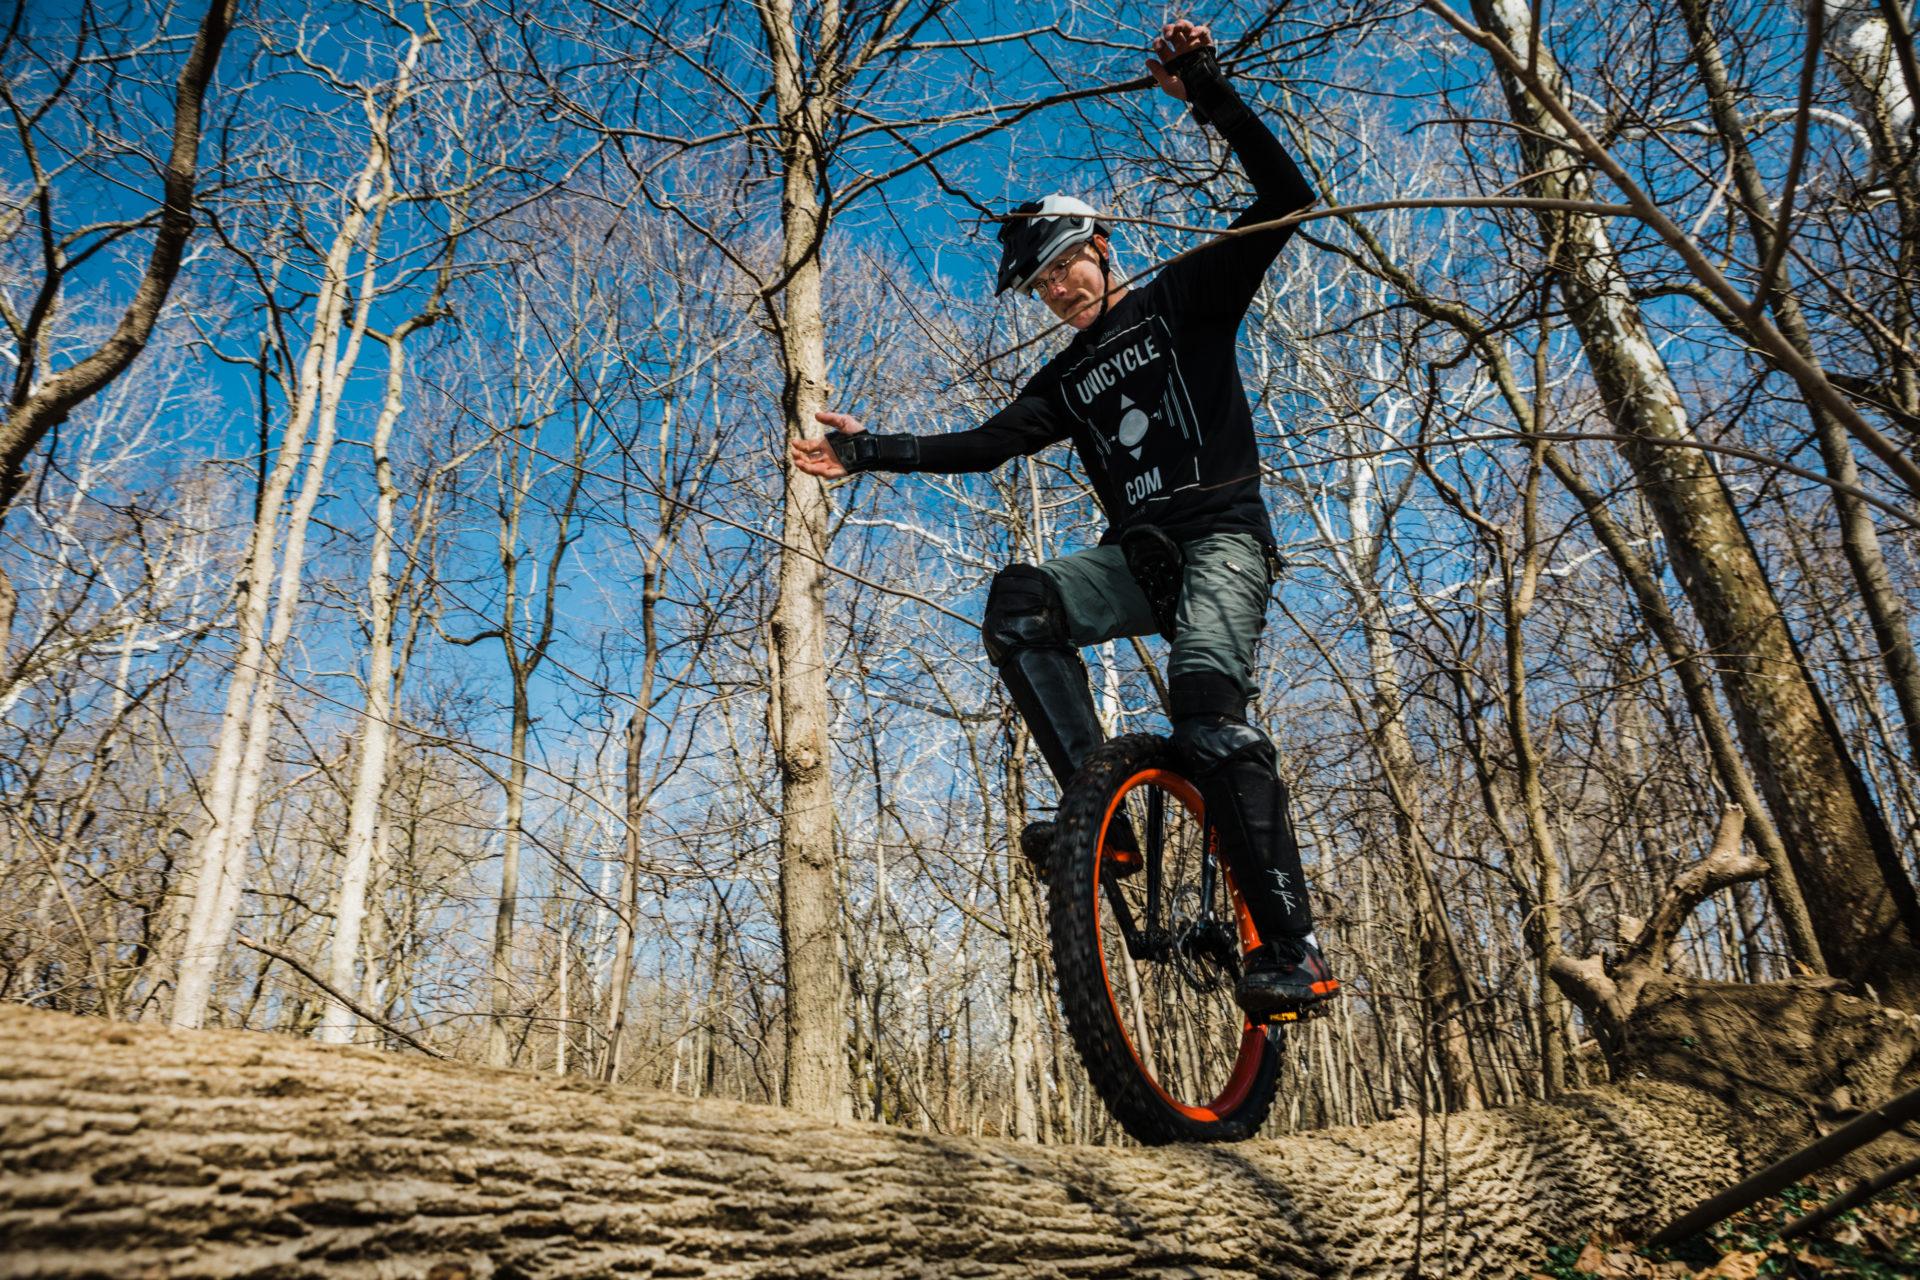 One-wheeled, 55yo Pelotonia rider grabbing life without the